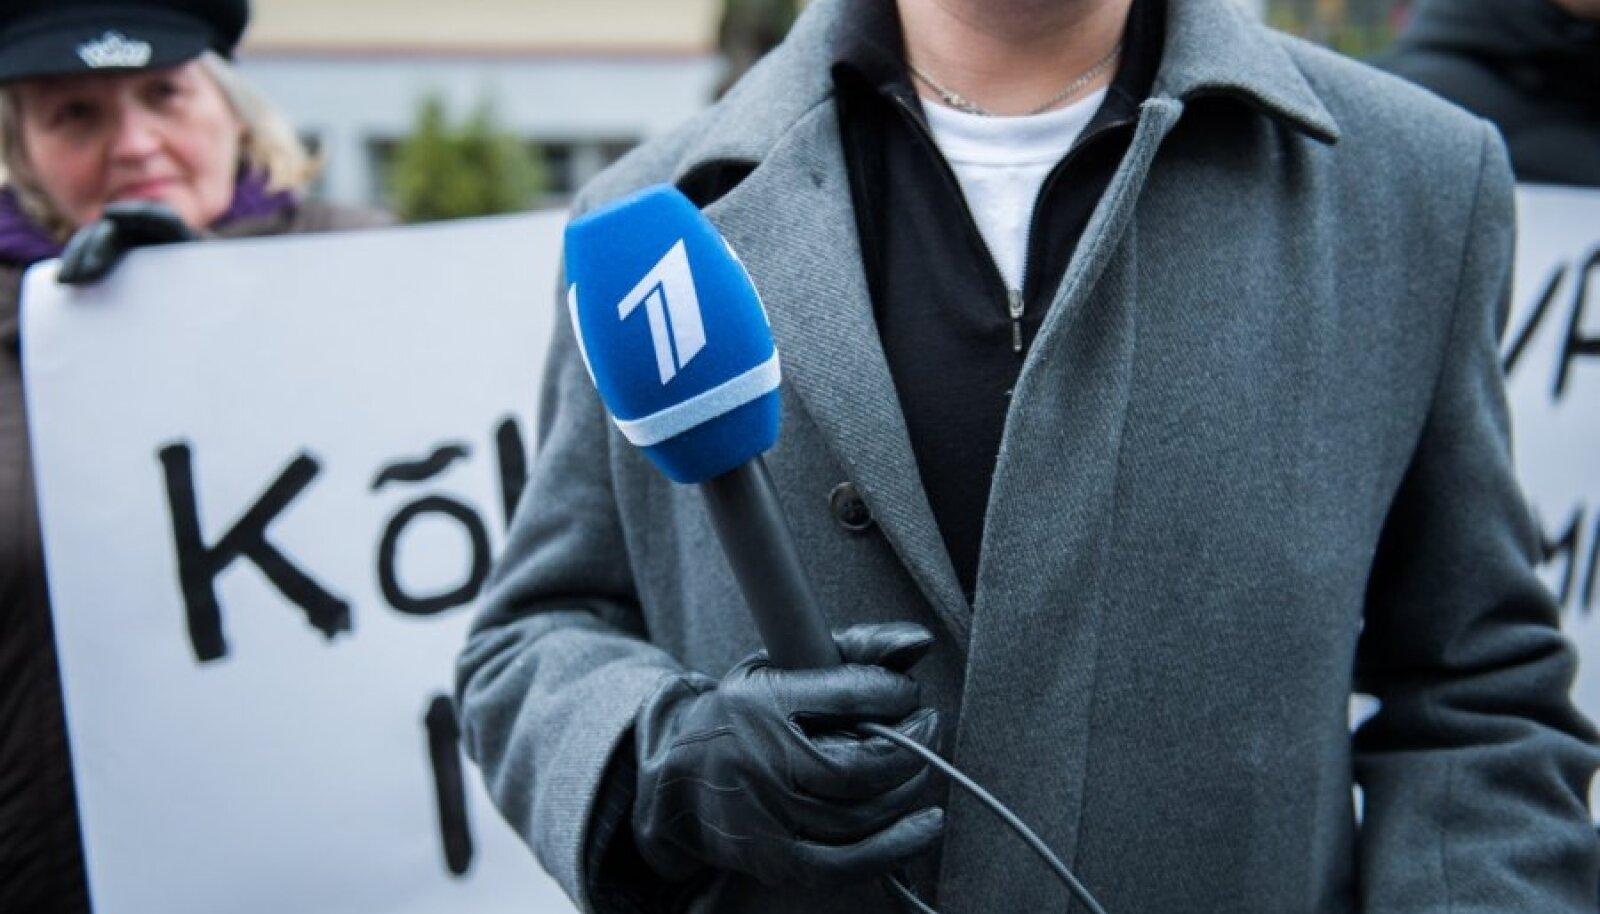 PBK reporter